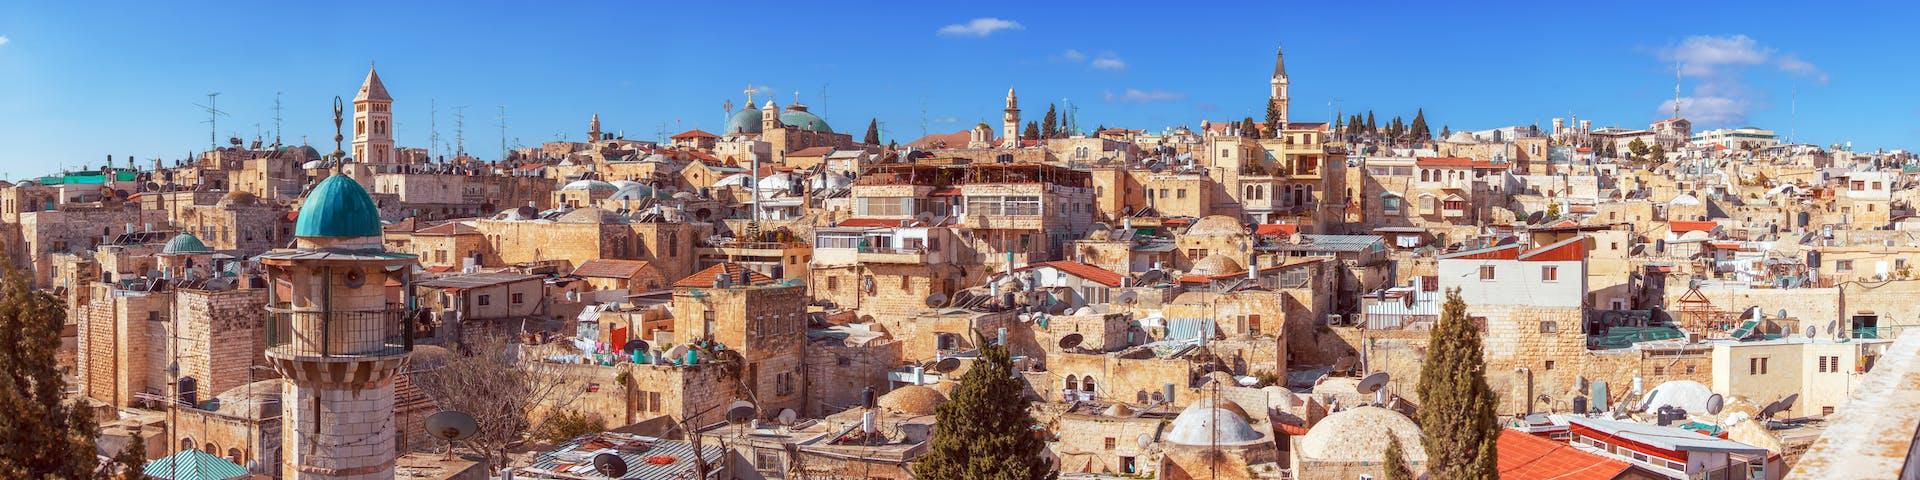 Bachelors in Israel - BachelorsPortal com